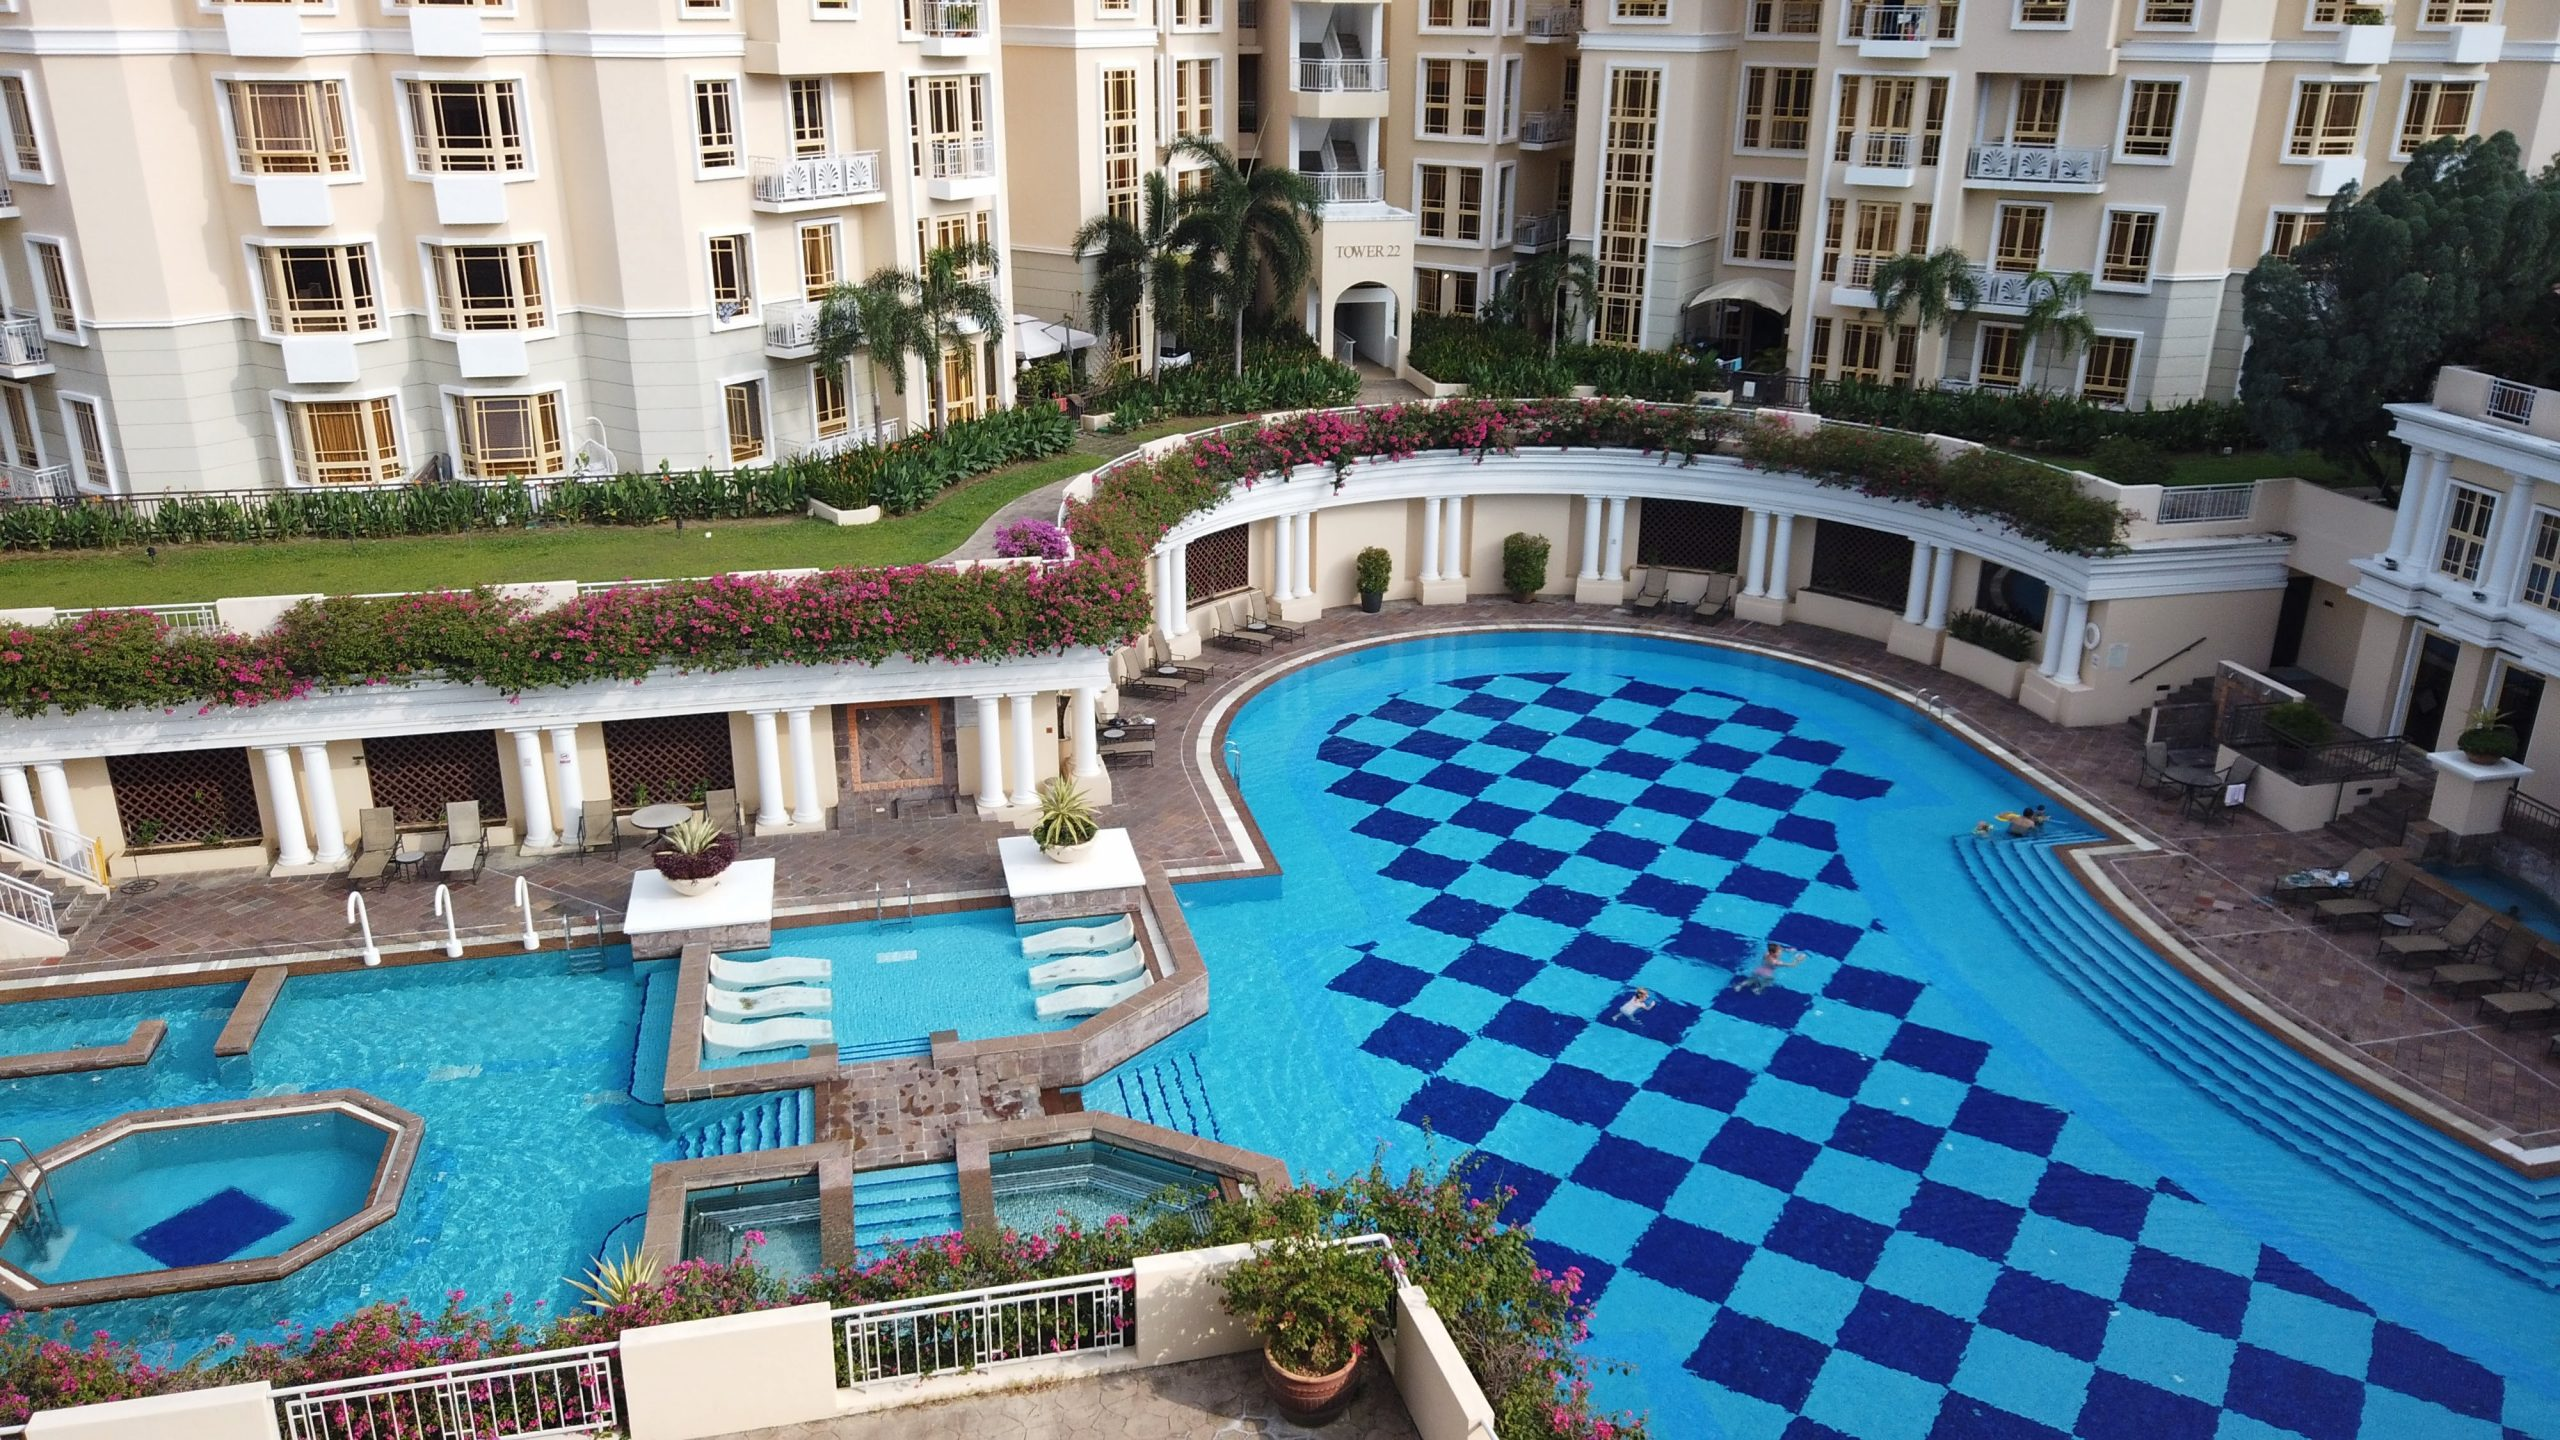 villa marina condo pool